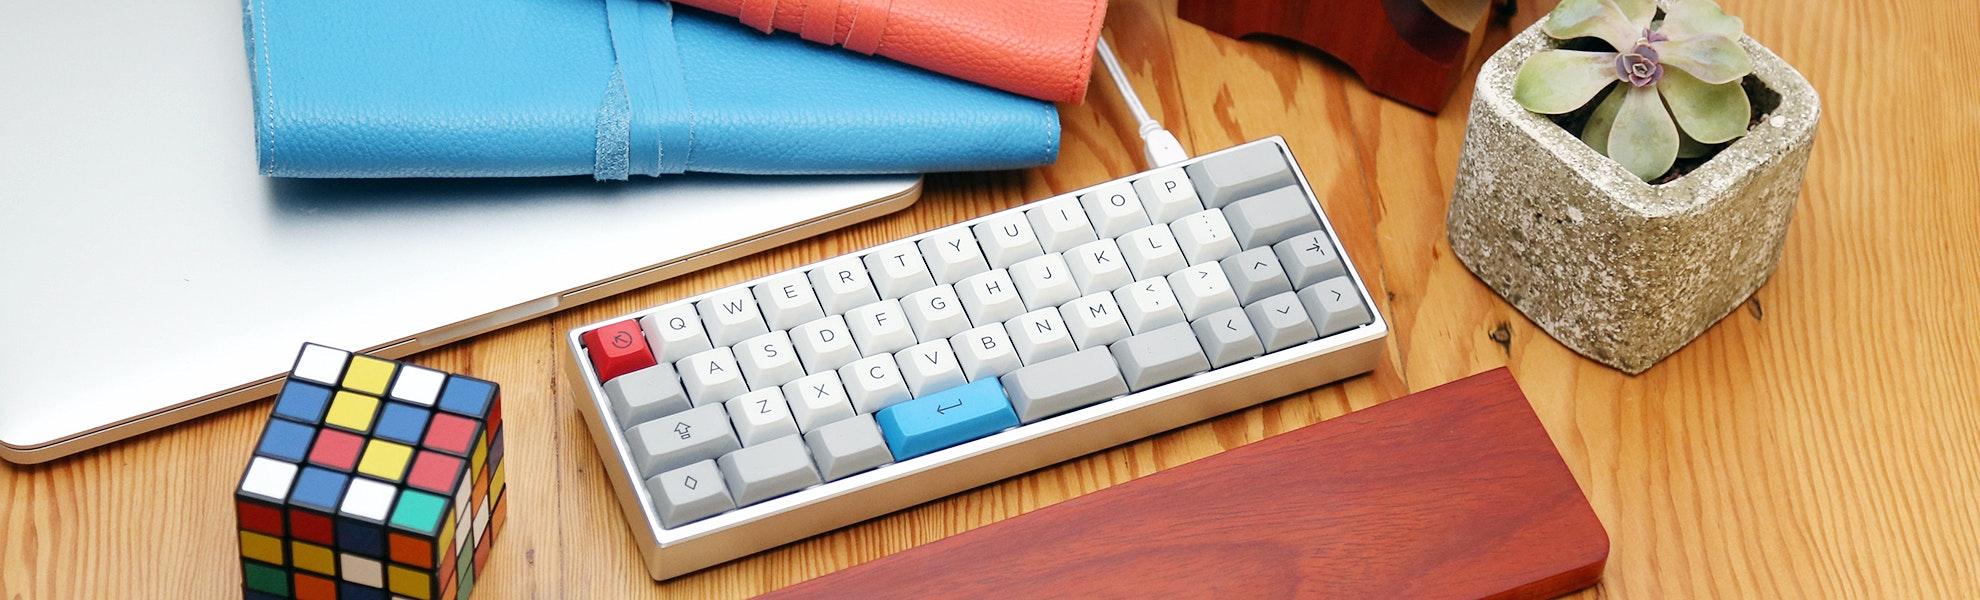 The MiniVan Custom Mechanical Keyboard Kit